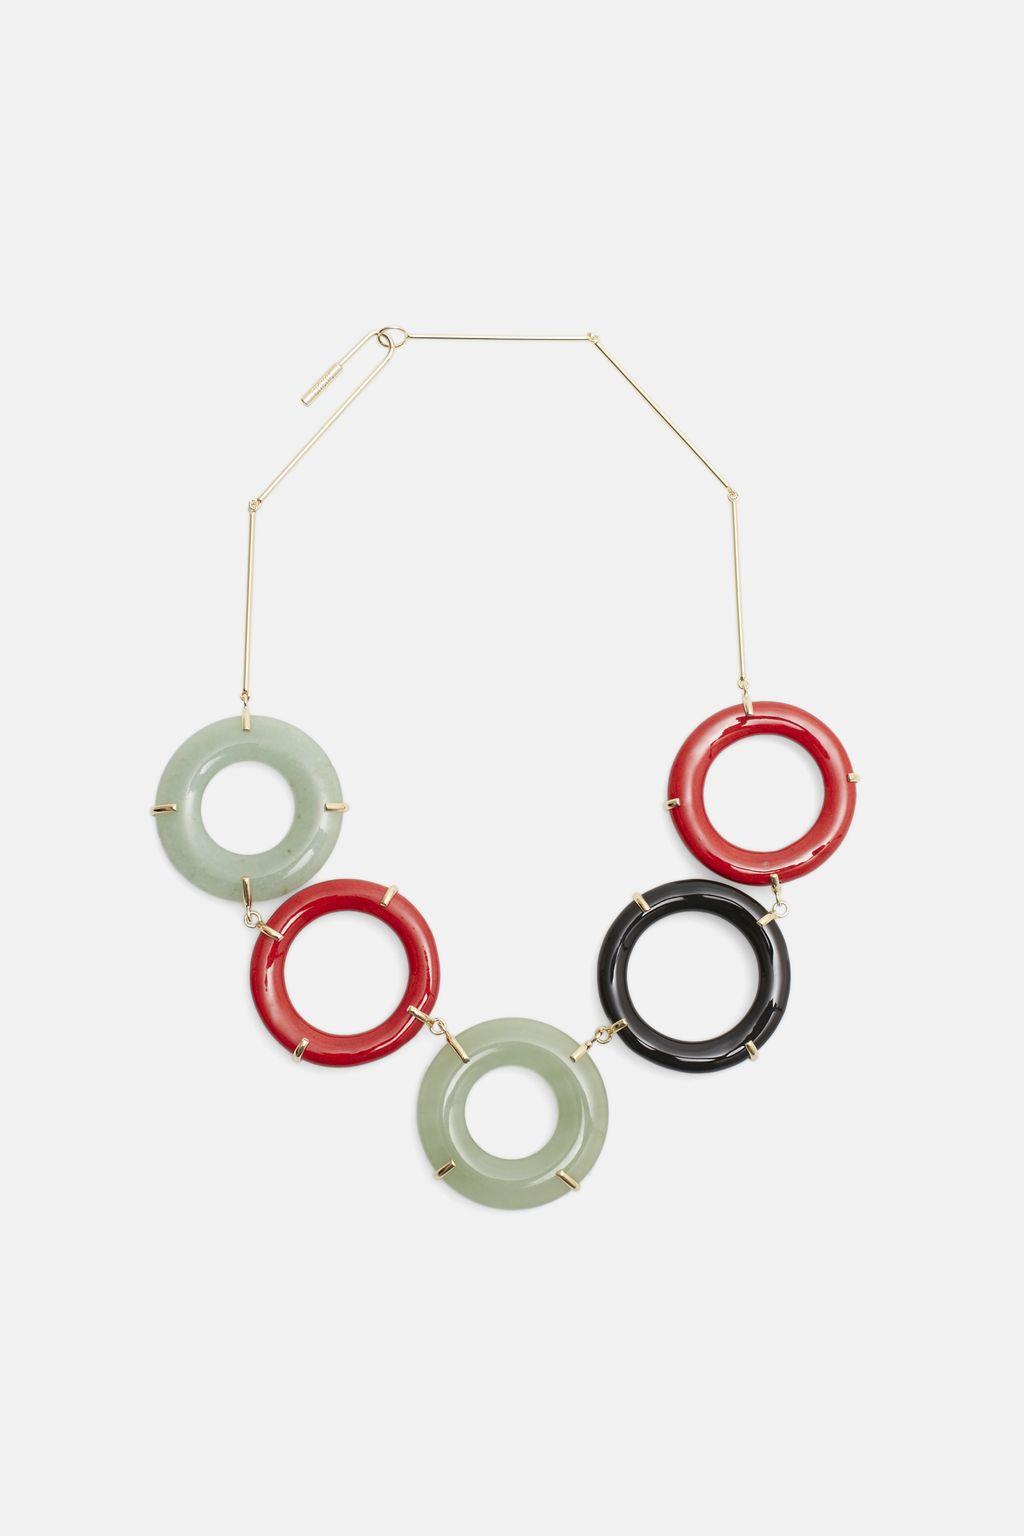 Moonscape necklace